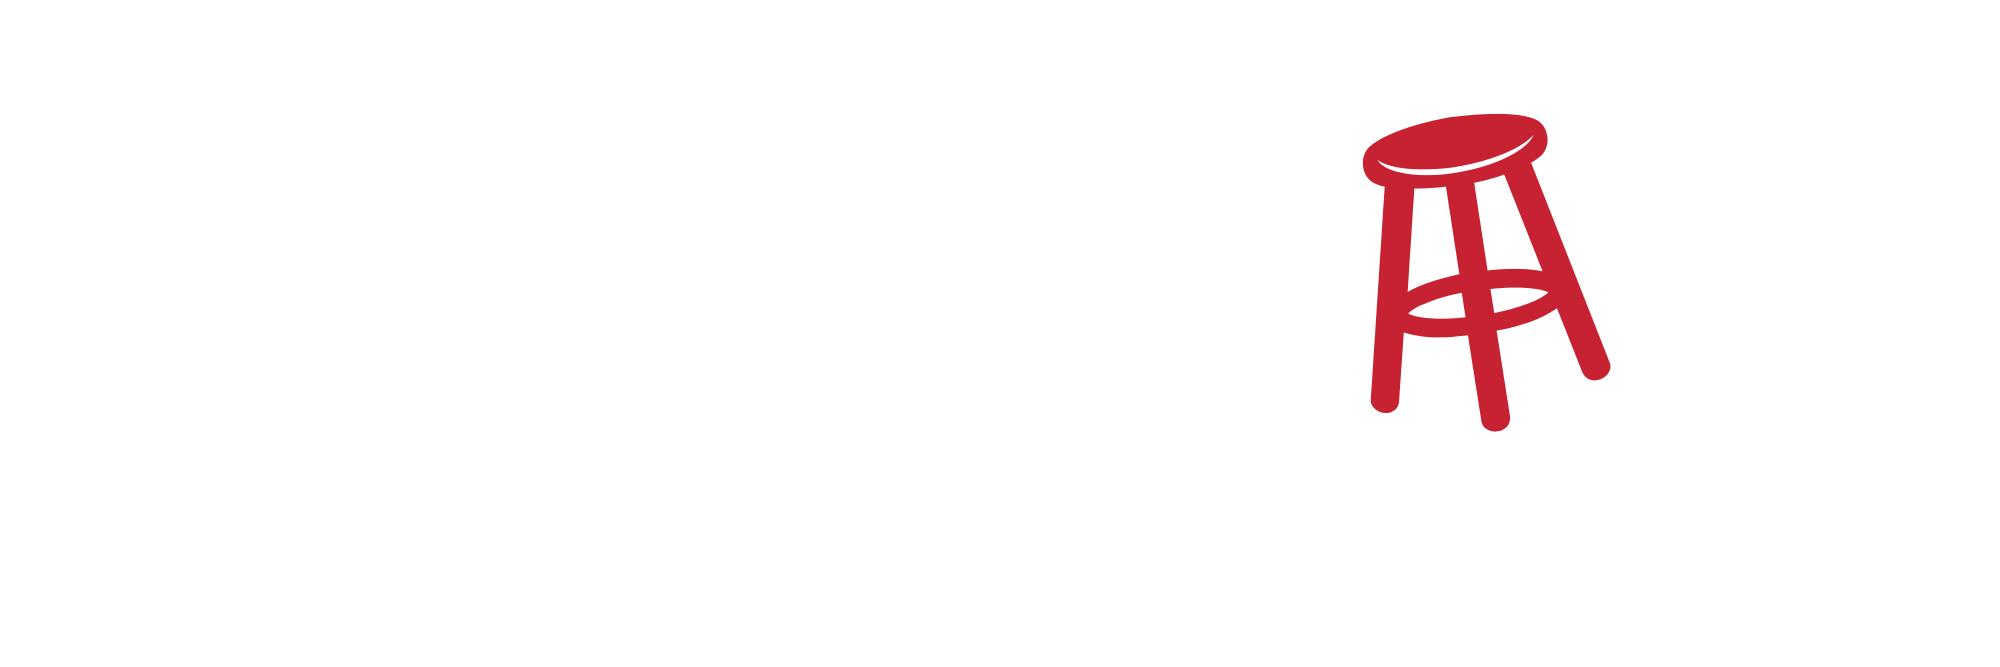 DAZN x Barstool Sports